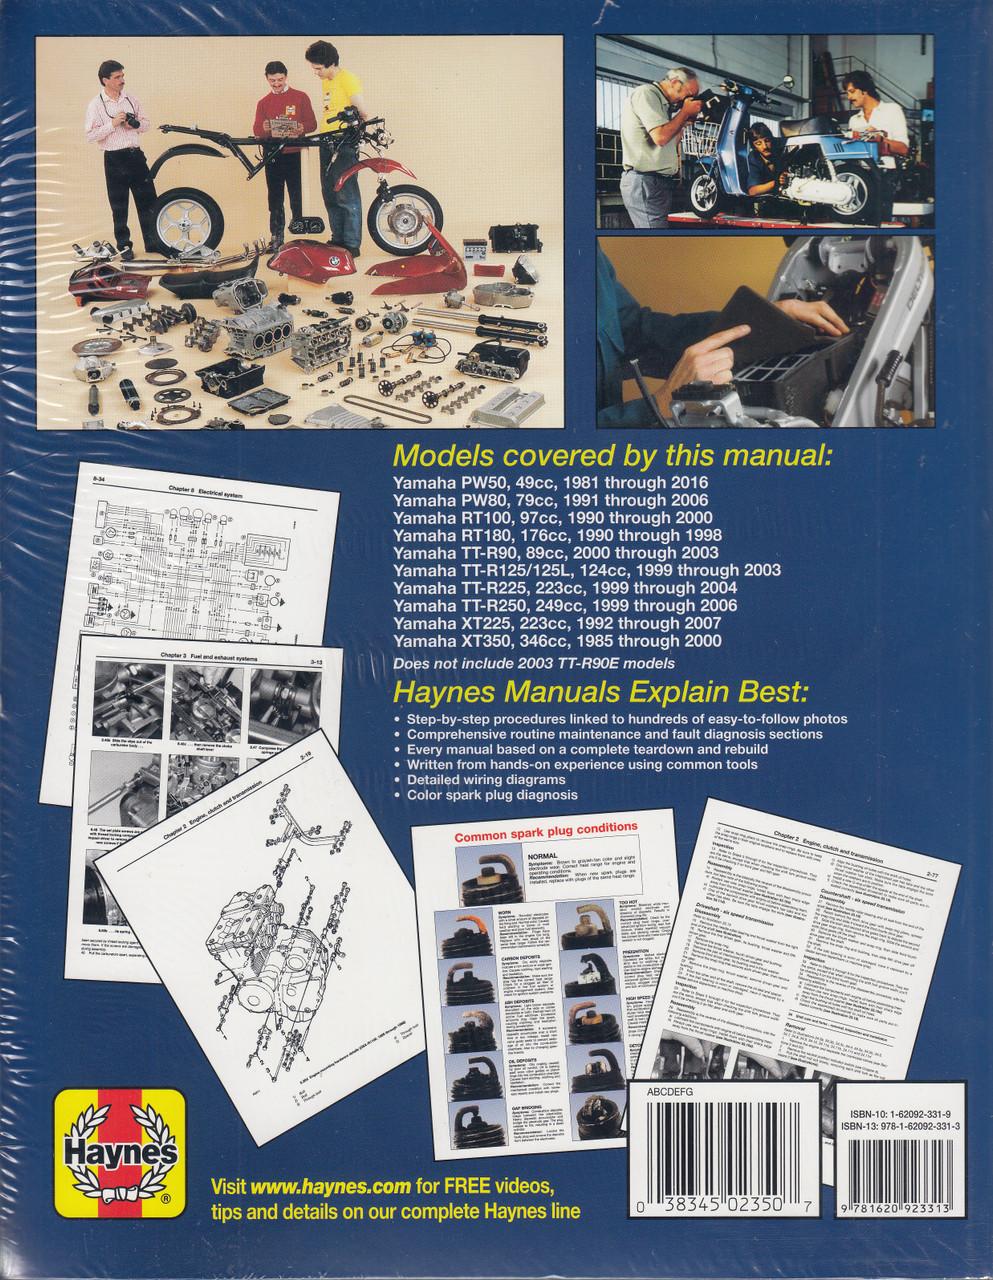 yamaha trail bikes pw, rt, tt-r, xt225 and xt350 1981 - 2016 workshop manual  (haynes, m2350)